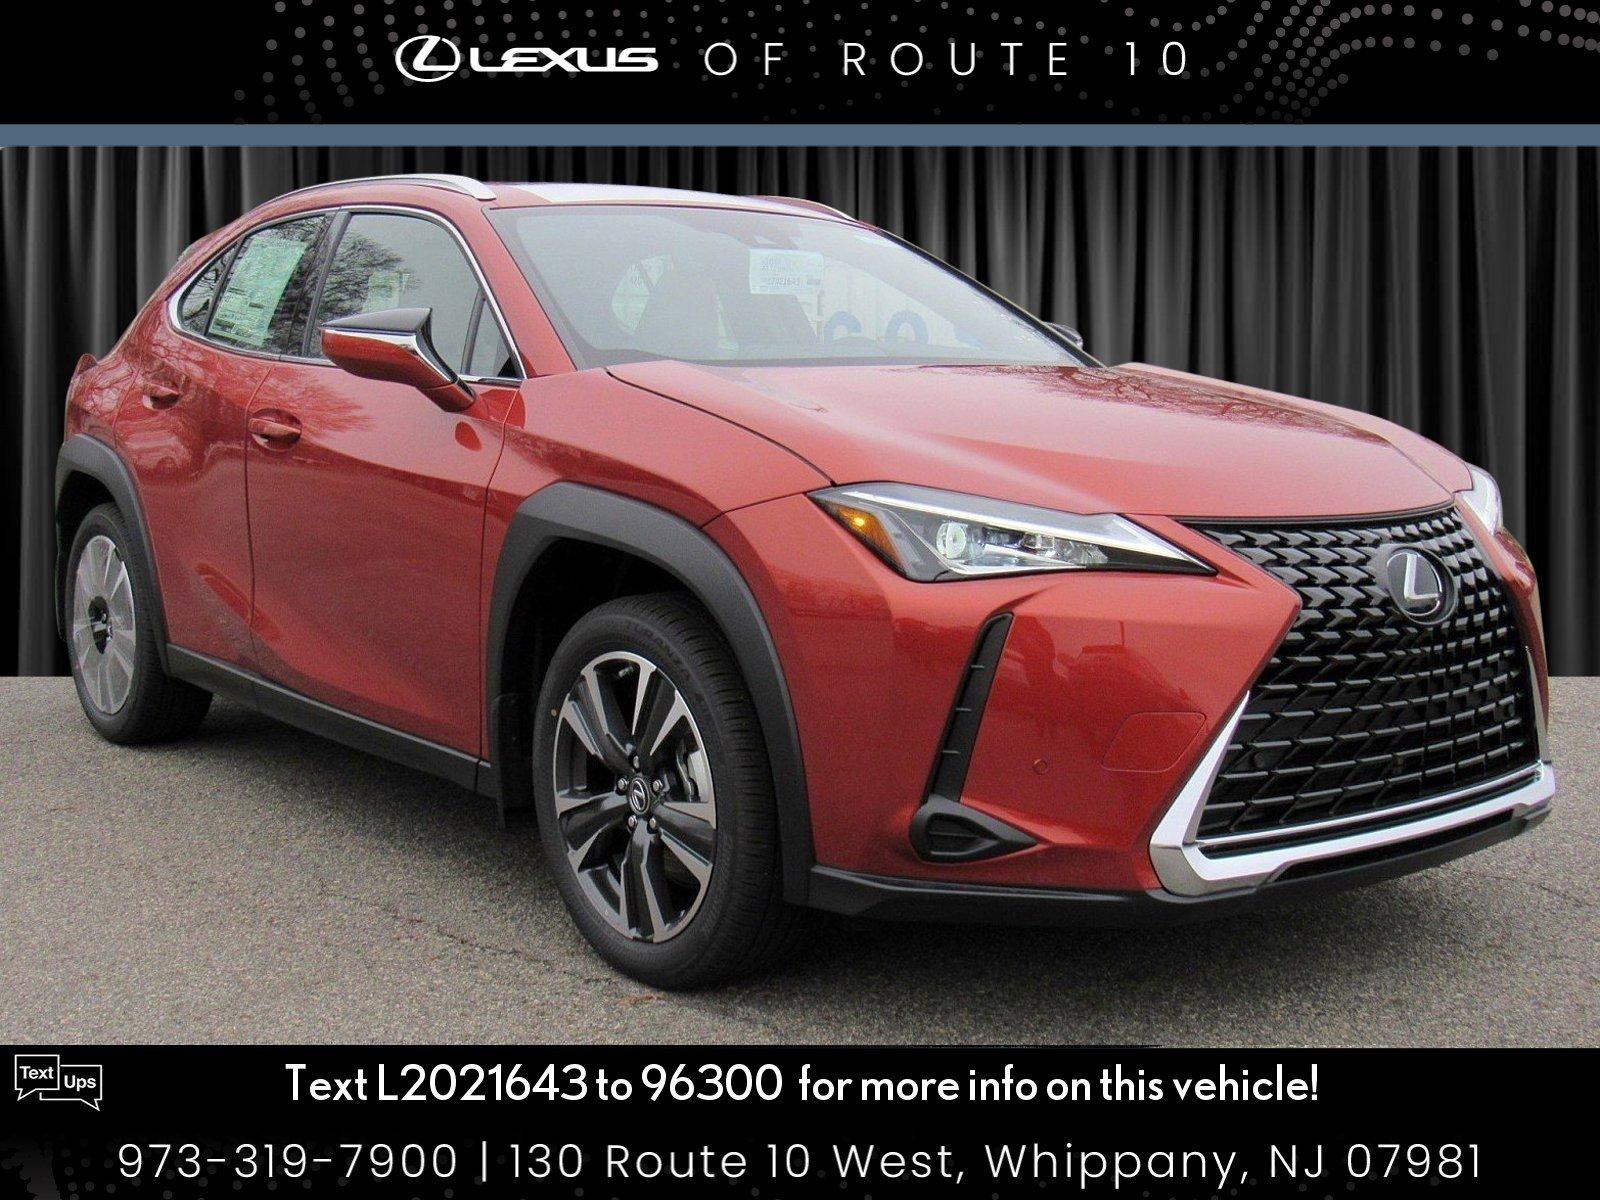 New 2020 Lexus UX UX 200